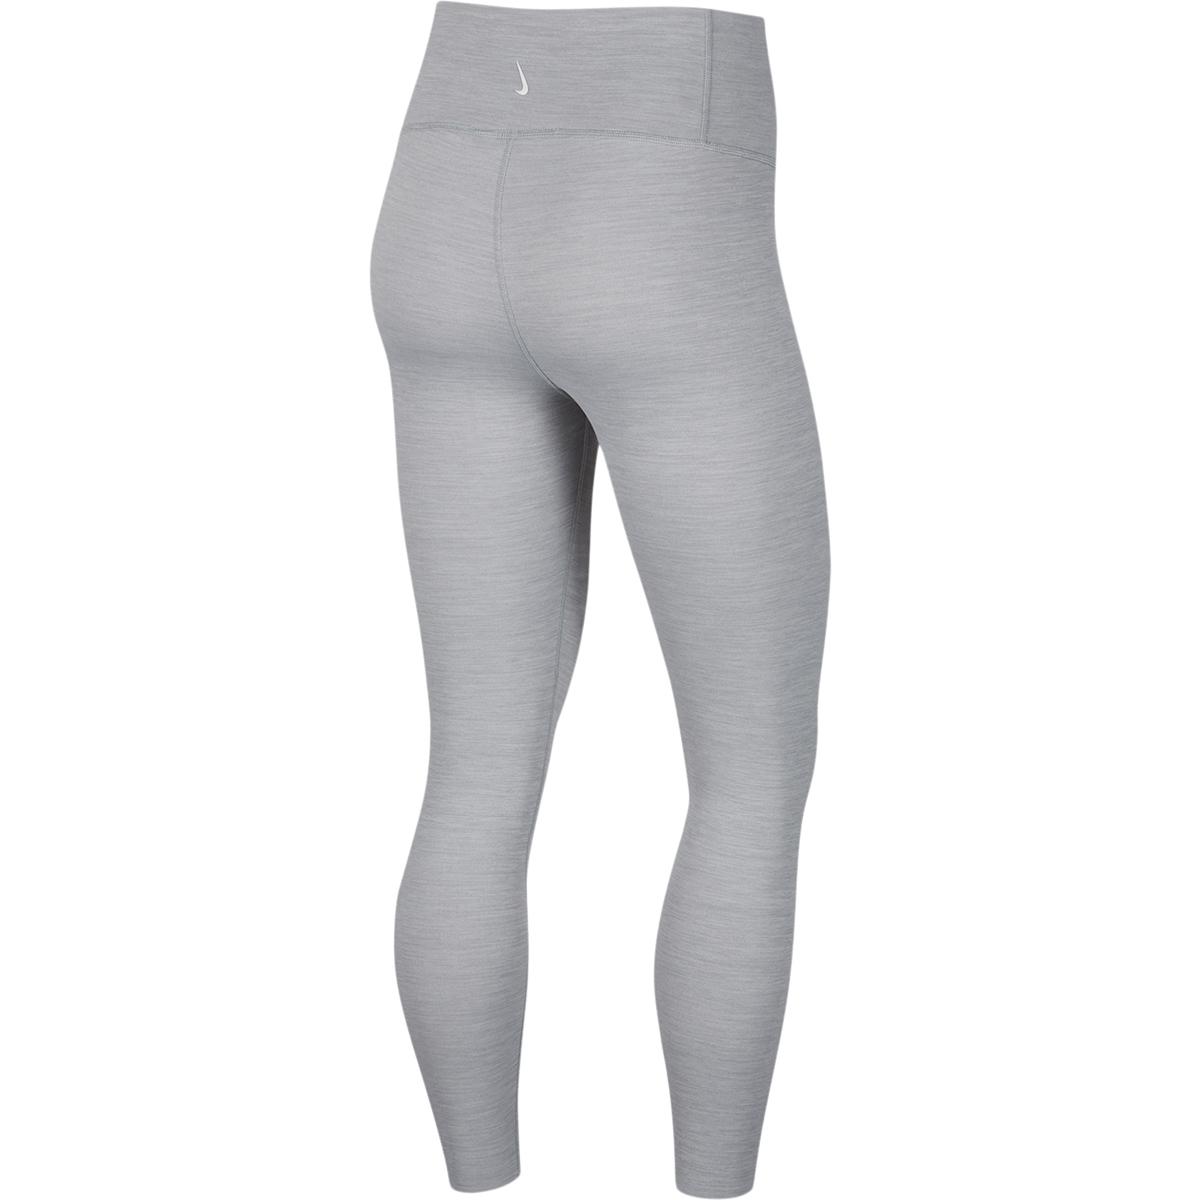 Nike Yoga Luxe 7/8 Træningstights Dame